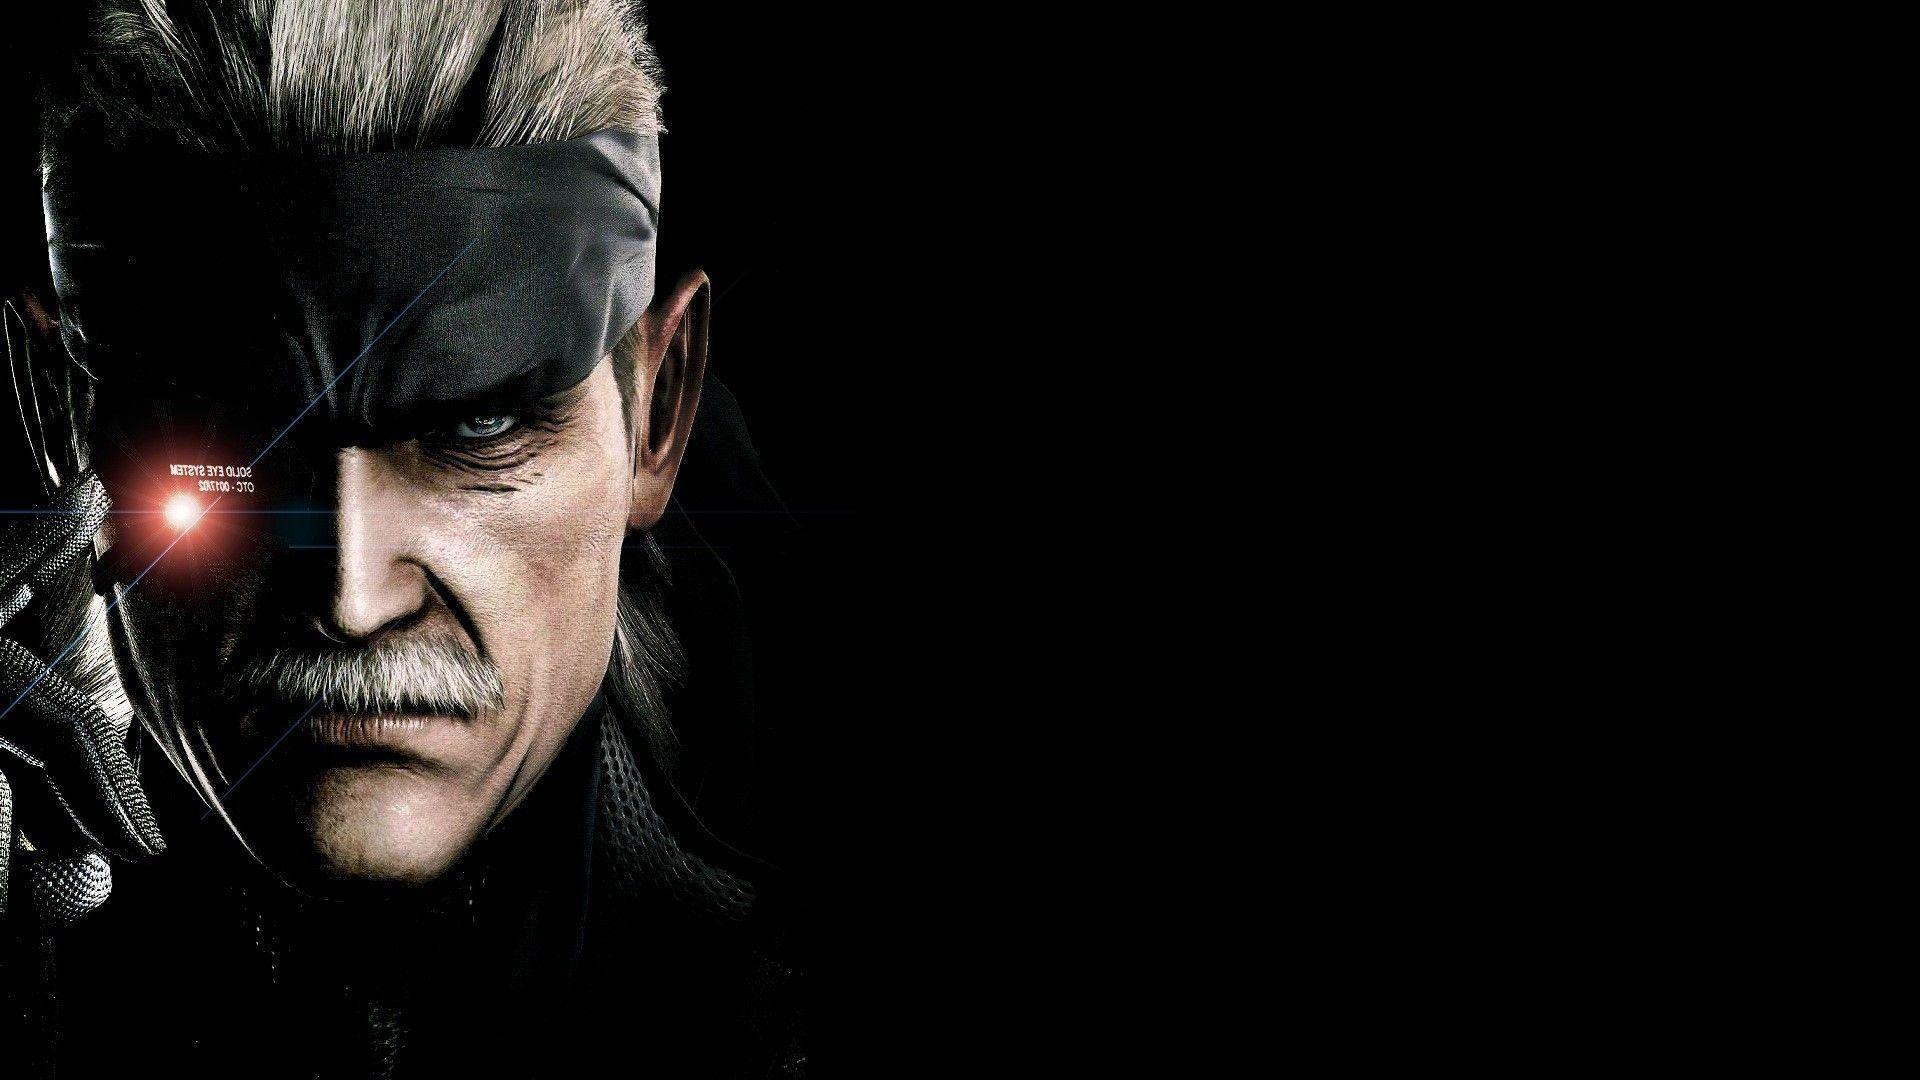 Metal Gear Solid V Video Game Wallpaper (6565) – Download Game .